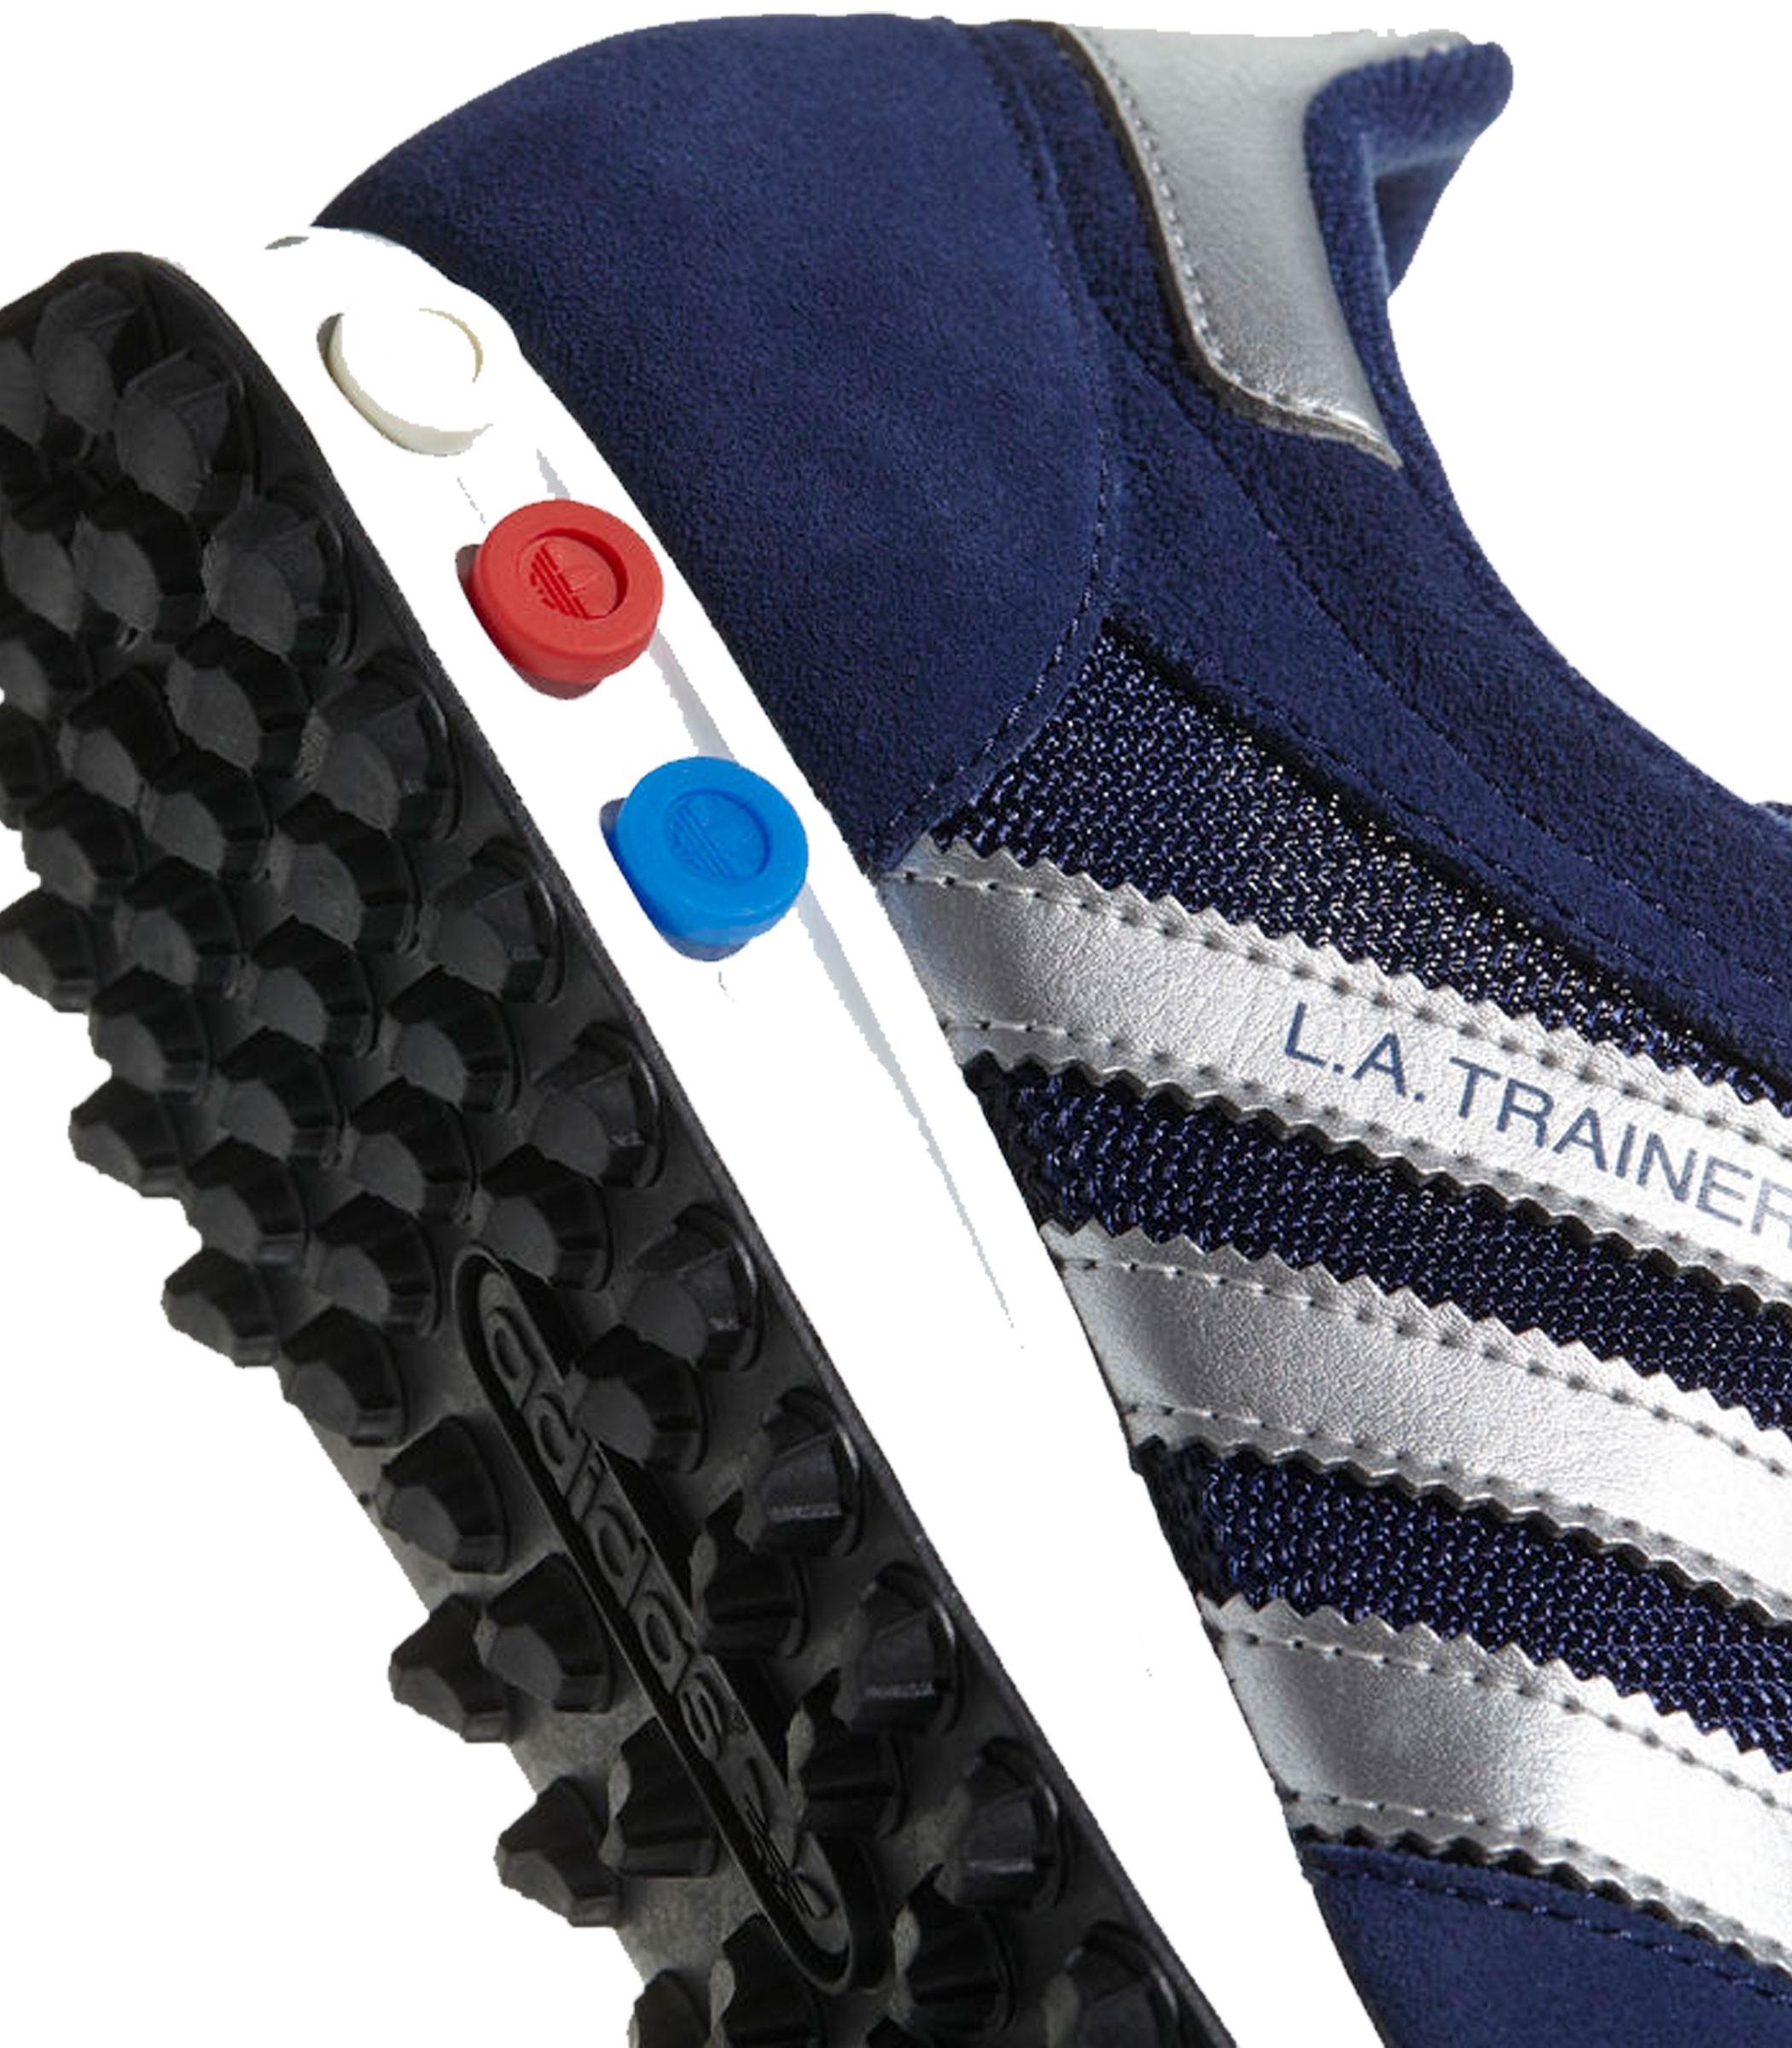 buy online 1f582 cd536 Uomo Scarpe Trainer La Adidas Da Ginnastica Cq2278 Rif wqFX4